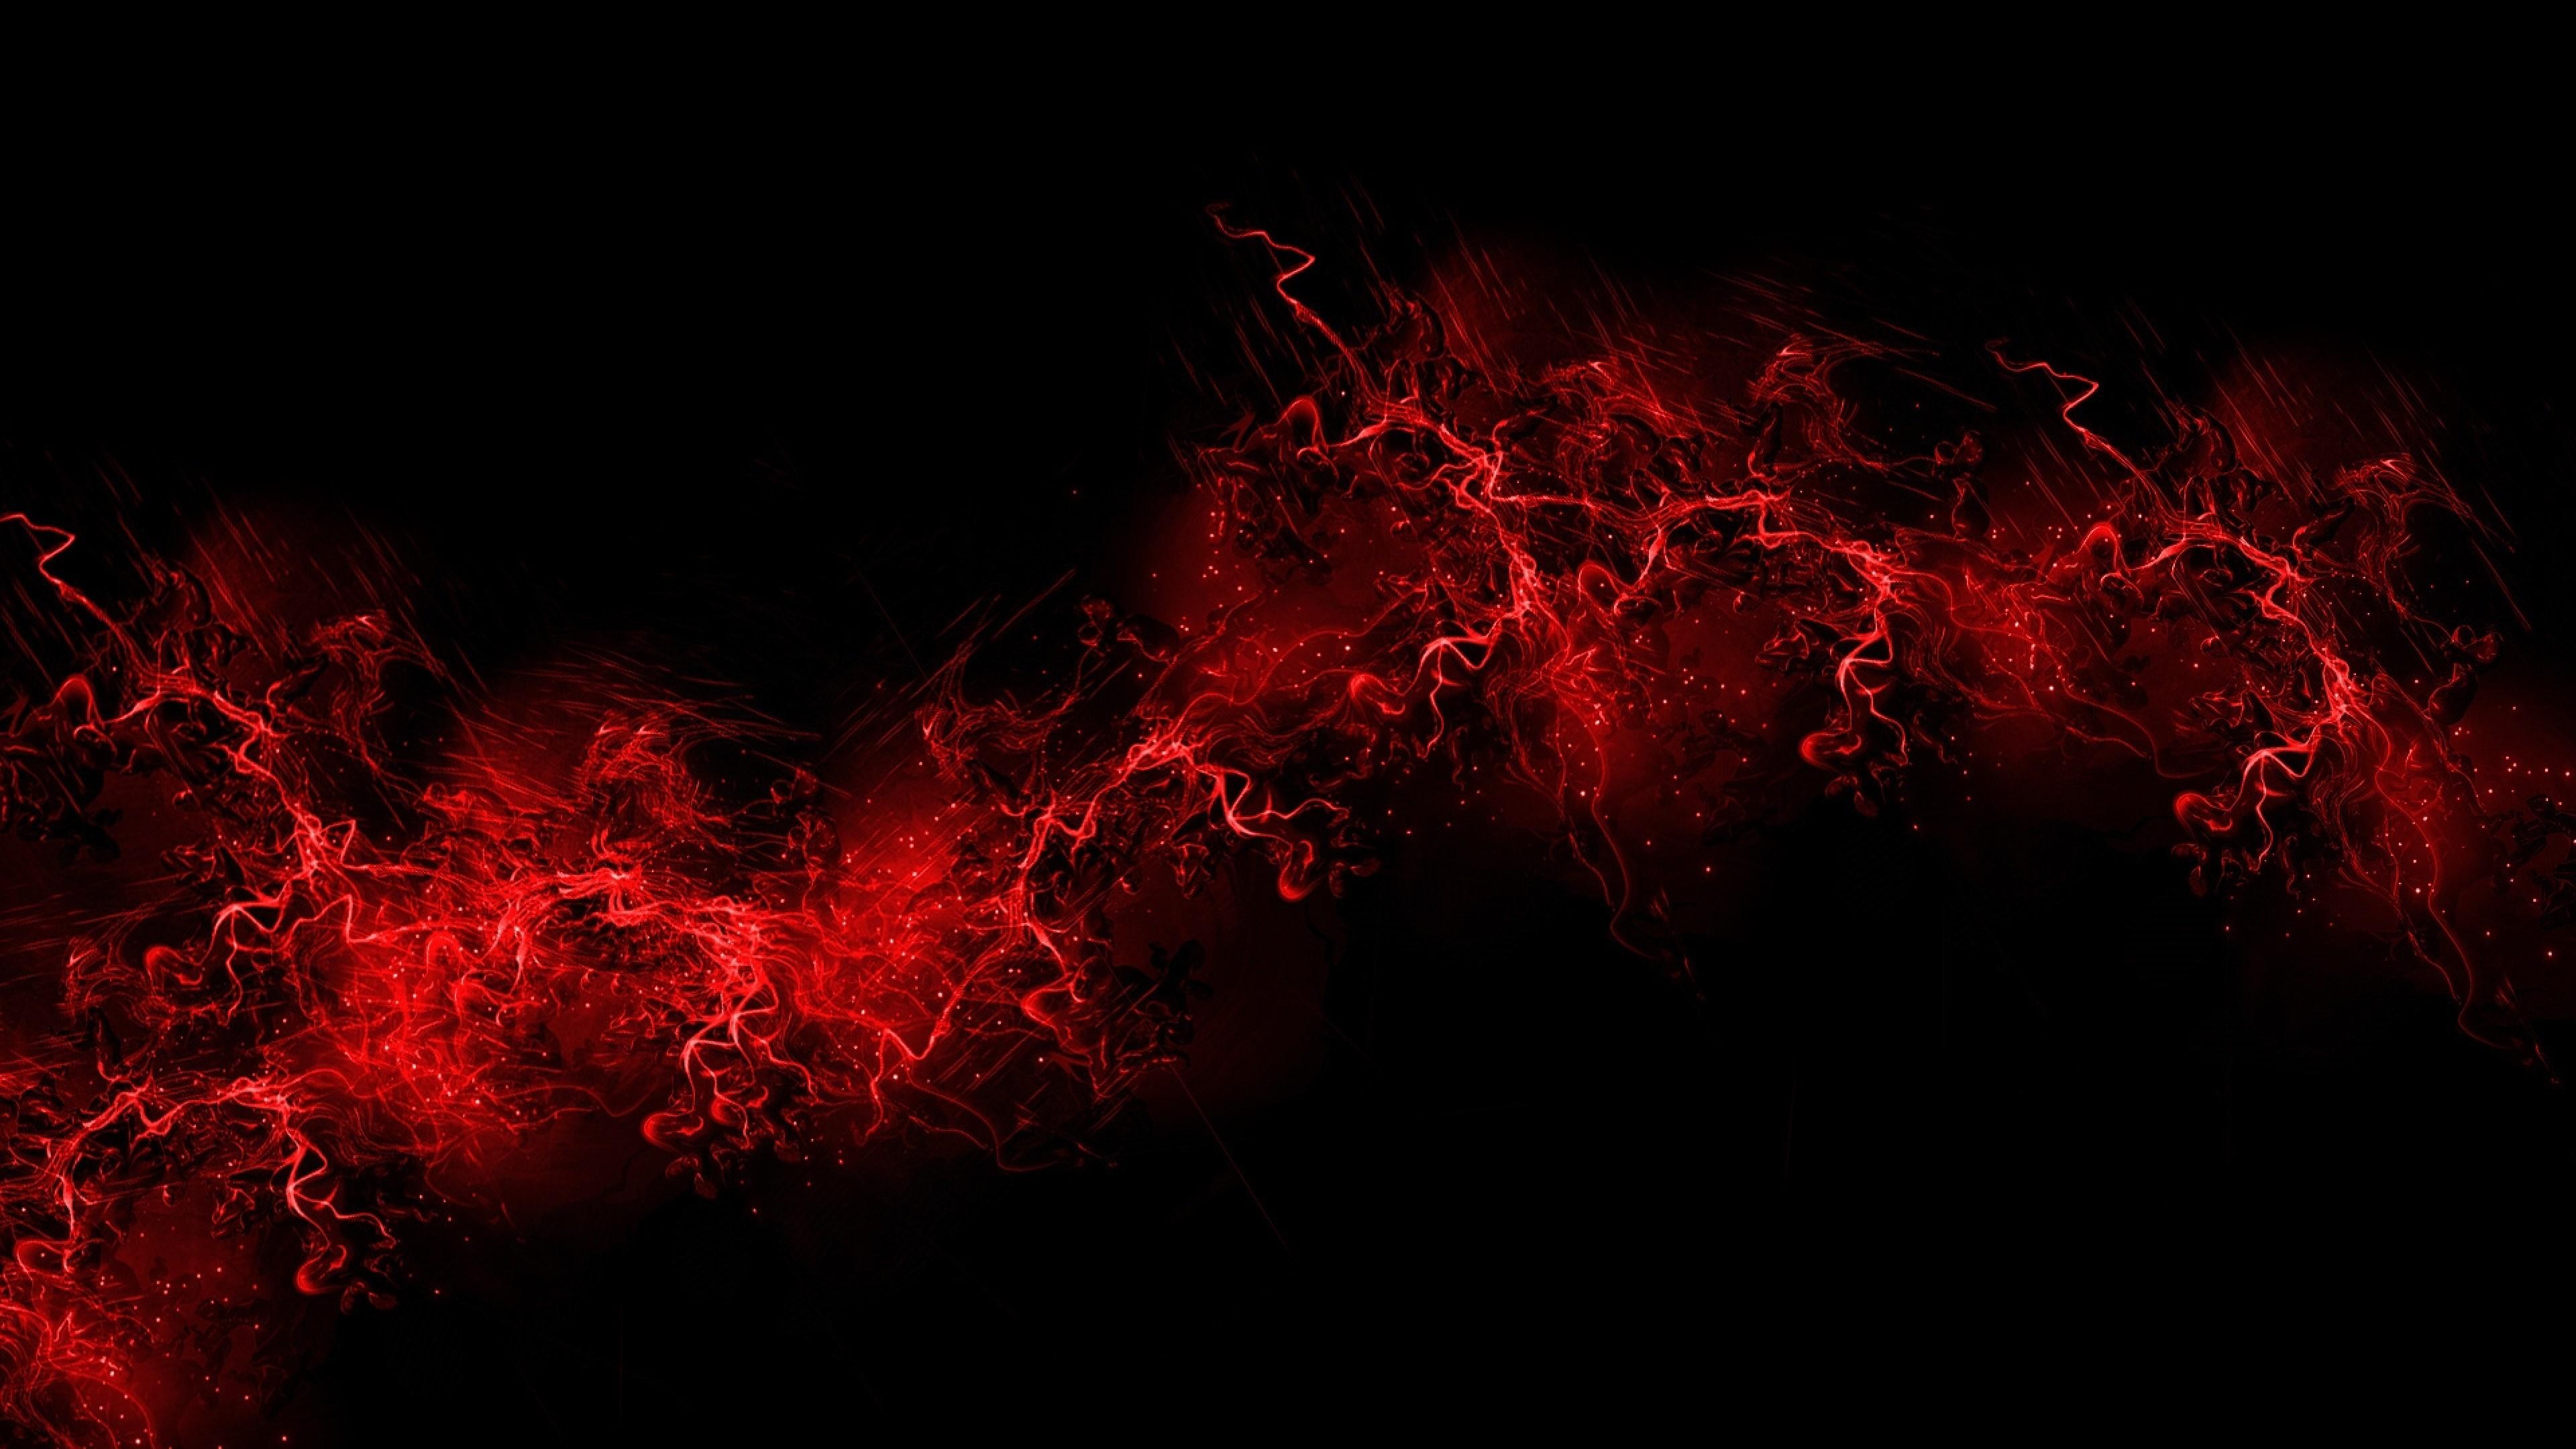 Wallpaper black background, red, color, paint, explosion, burst